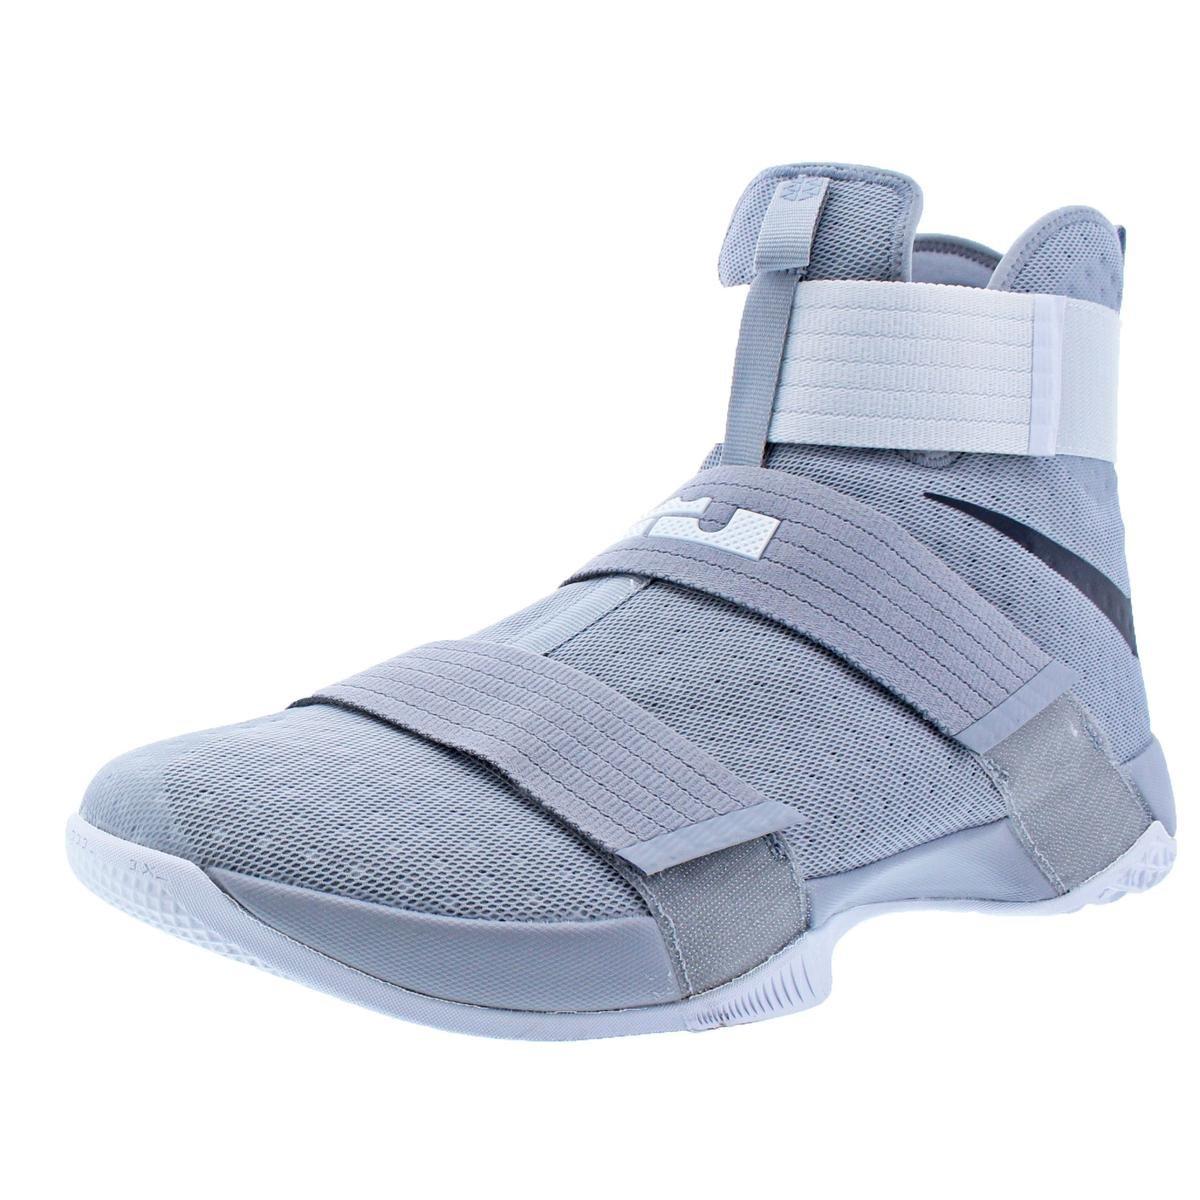 NIKE Lebron Soldier 10 Mens Basketball Shoes B073NG56HL 18 Medium (D) D US Mens|Wolf Grey/Black/White